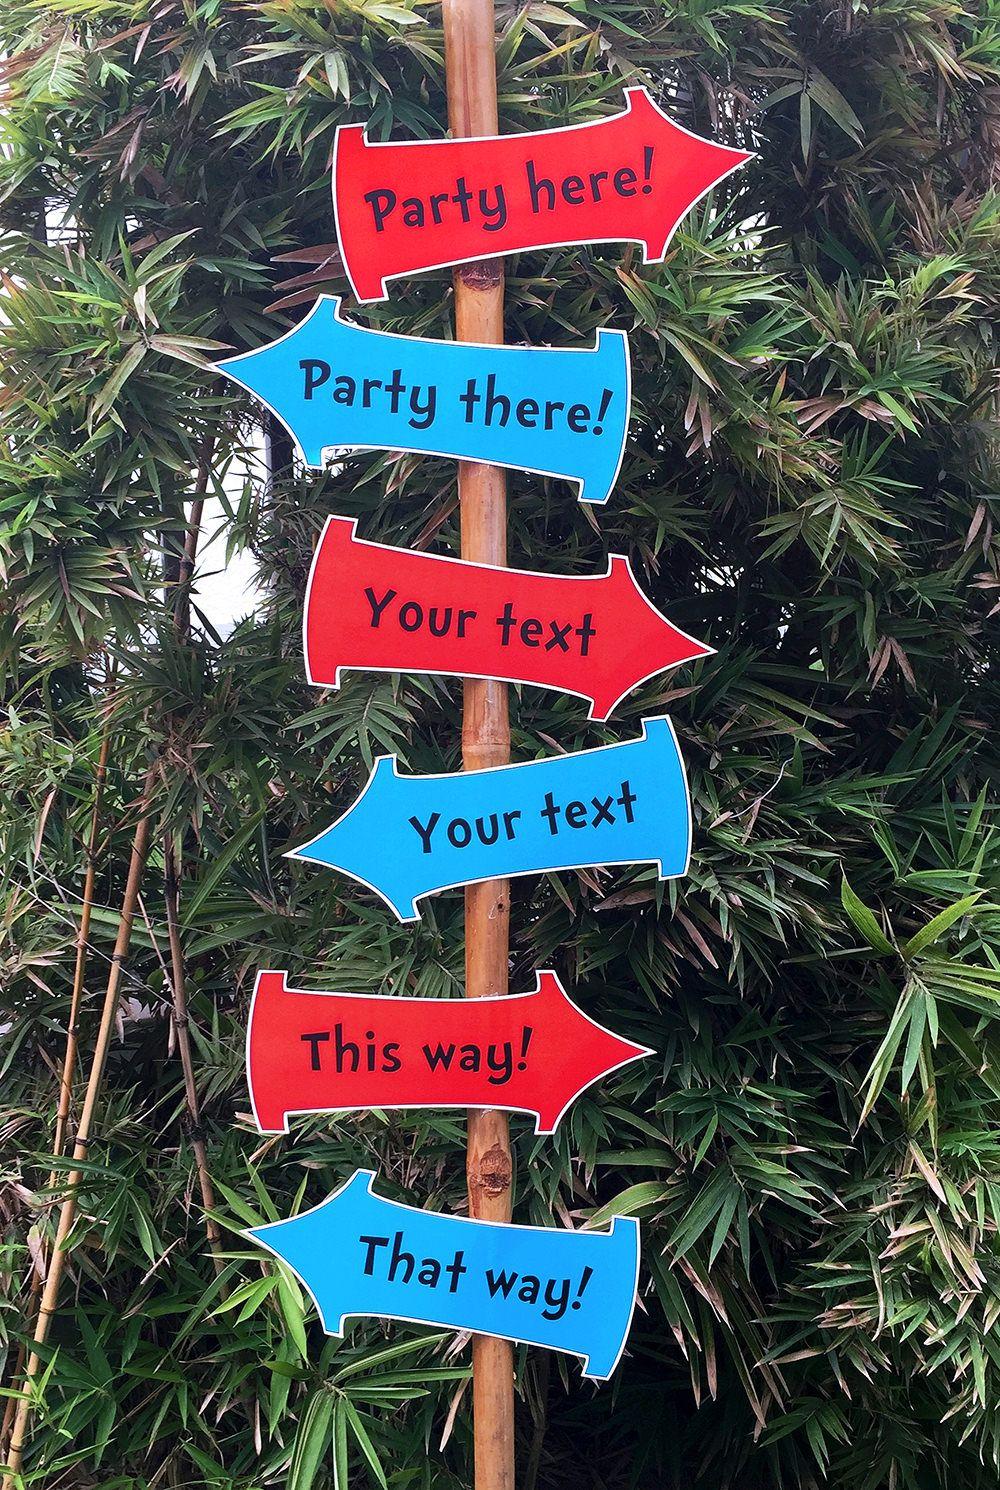 Dr Seuss Party Printables, Invitations & Decorations | Pinterest ...